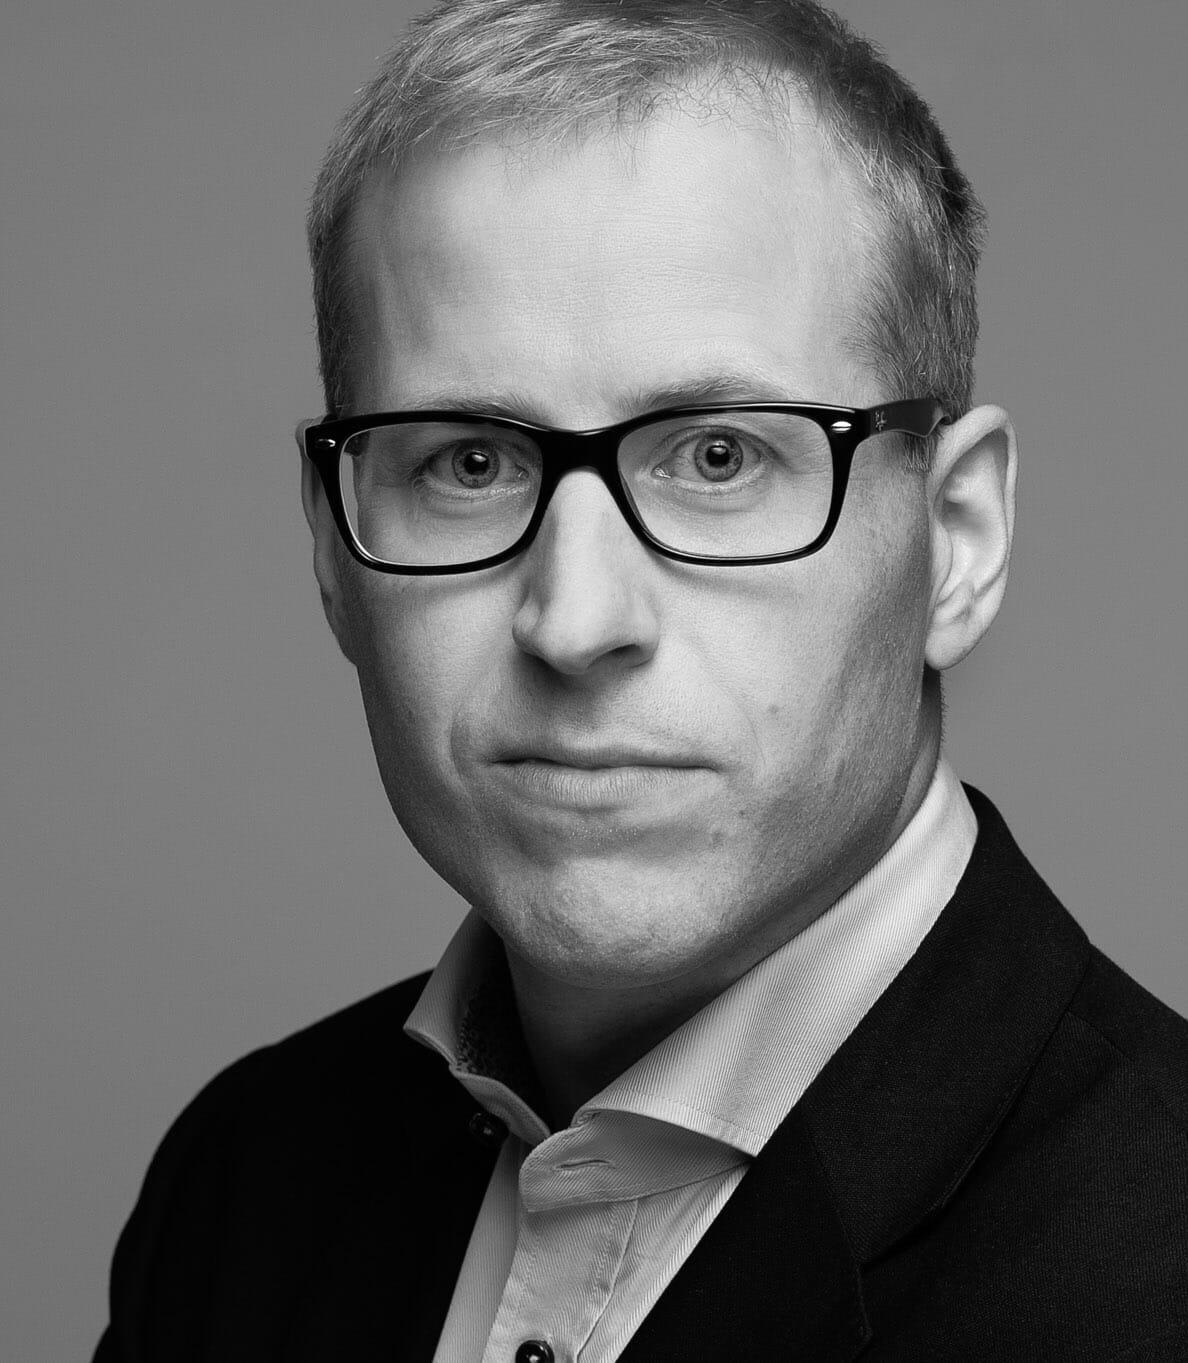 Niklas Briselius